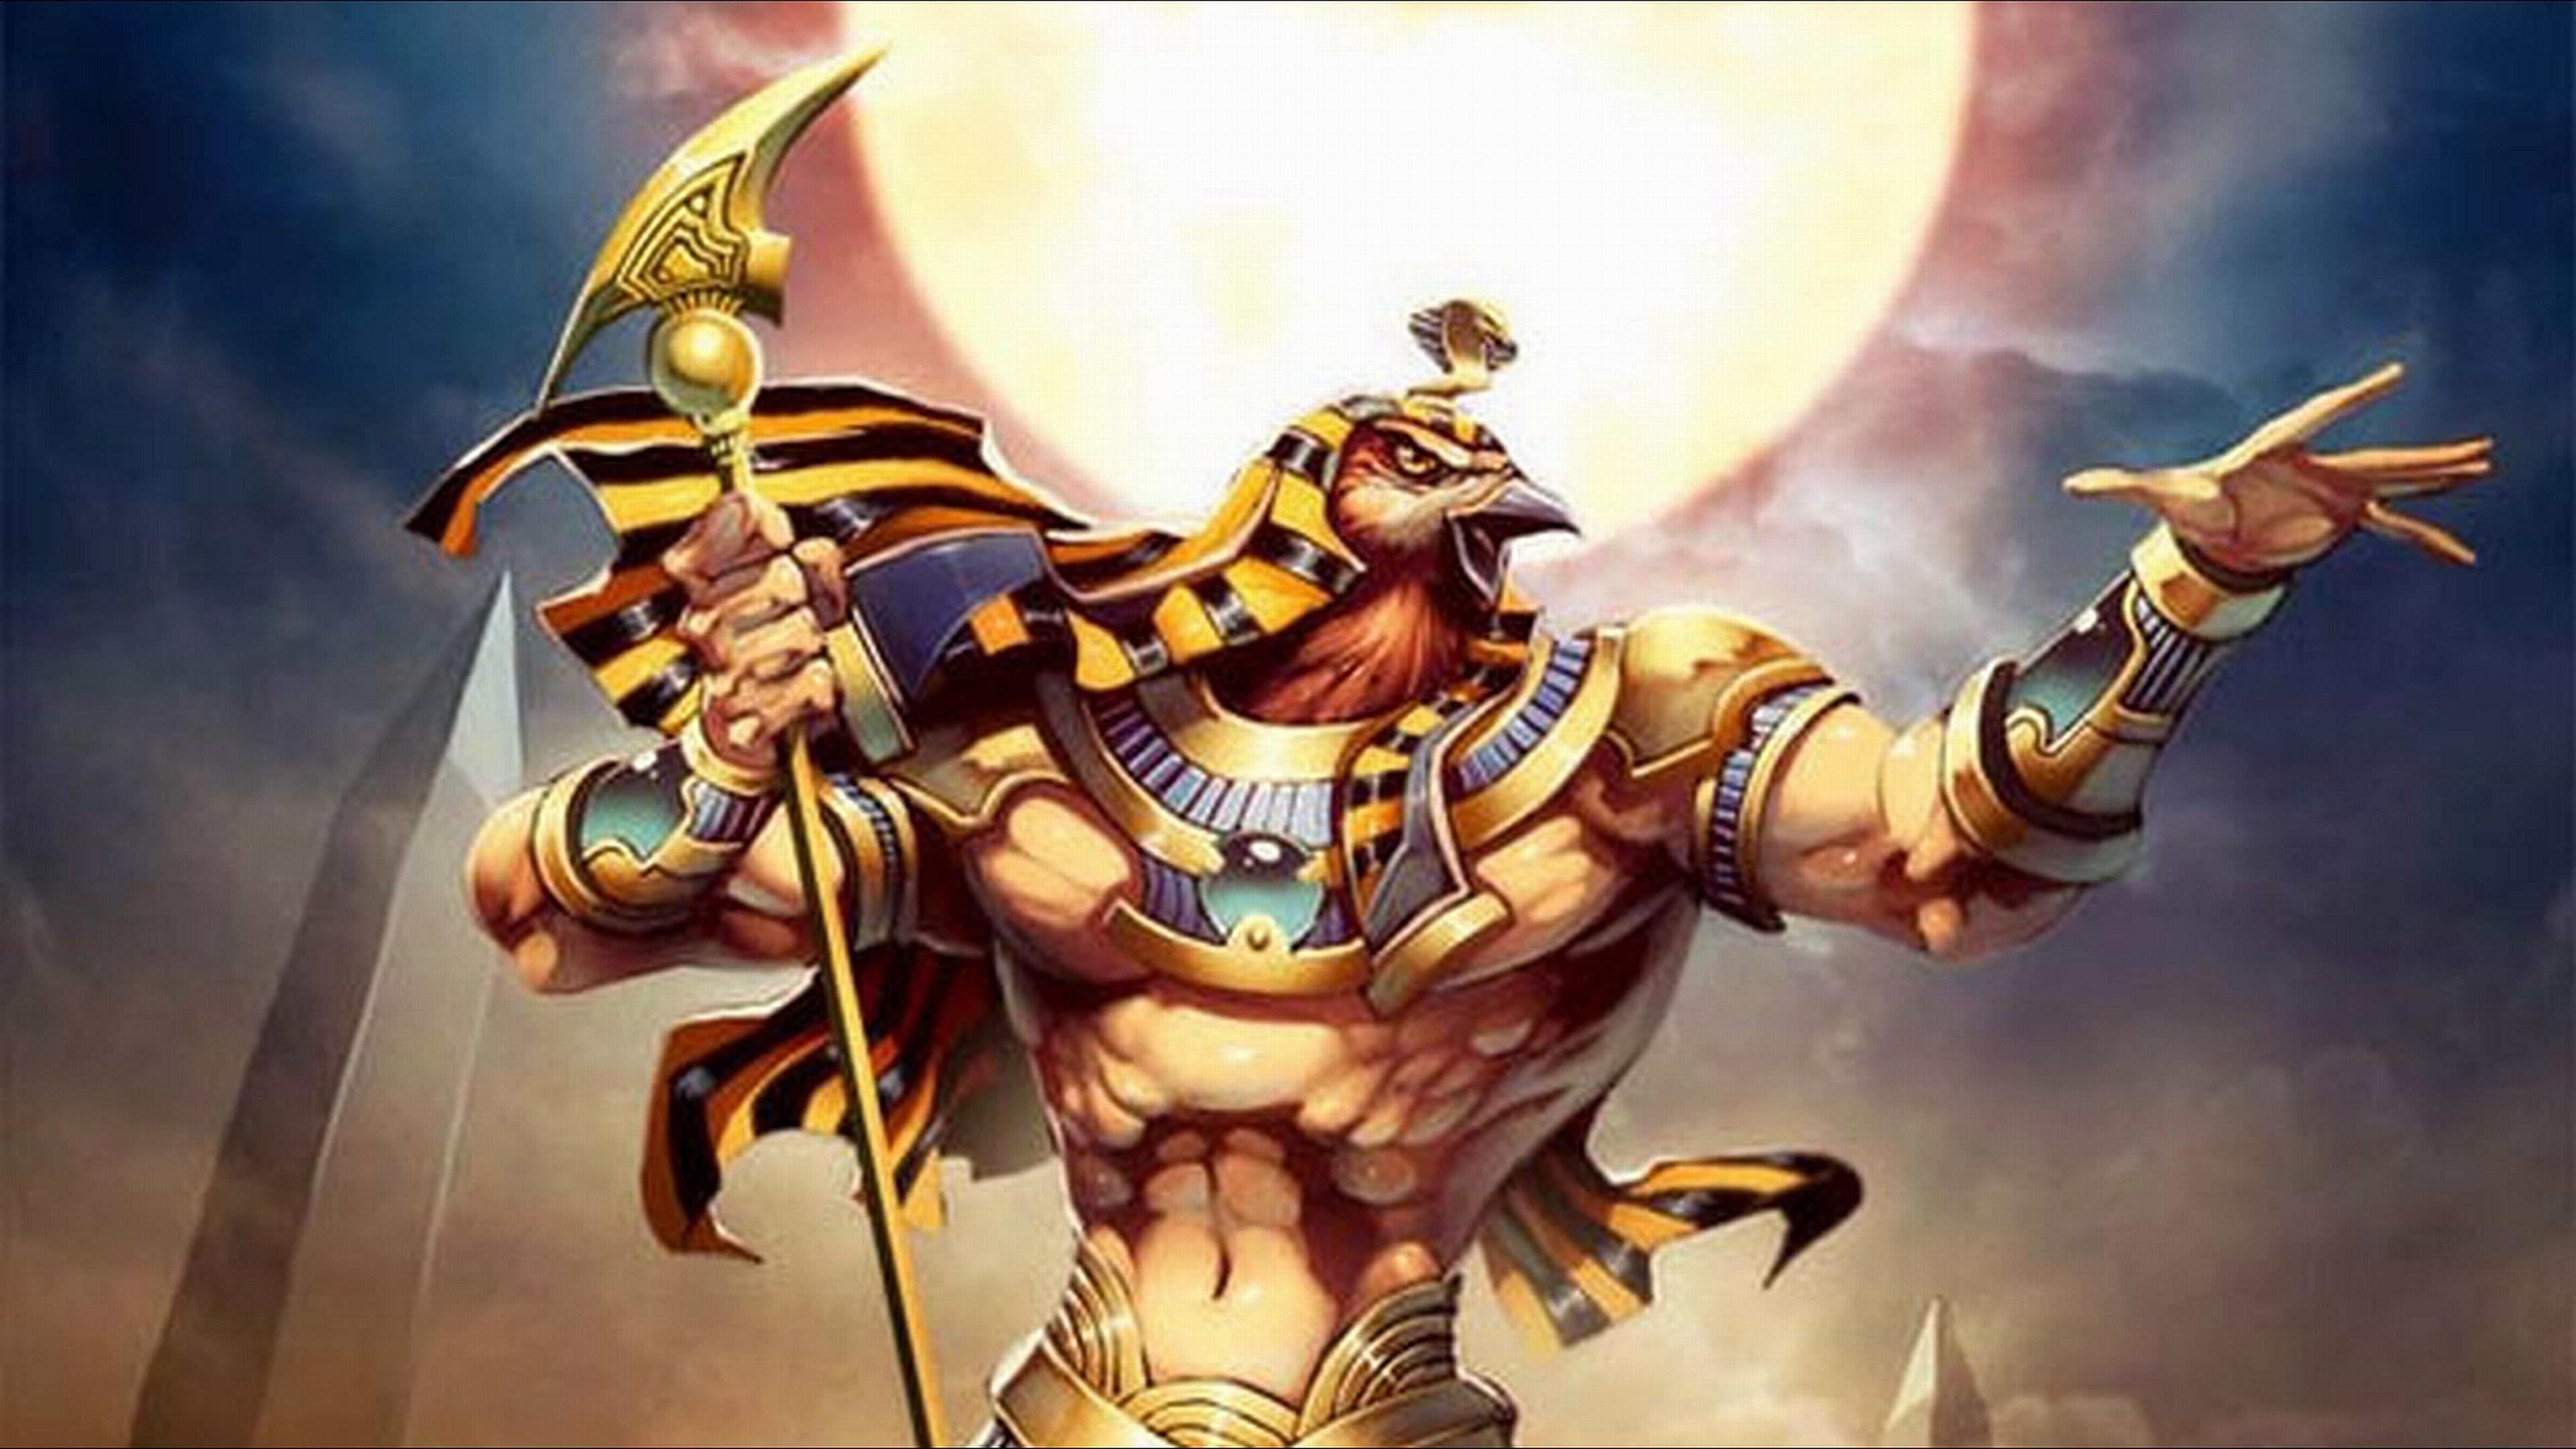 Free gods wallpaper background